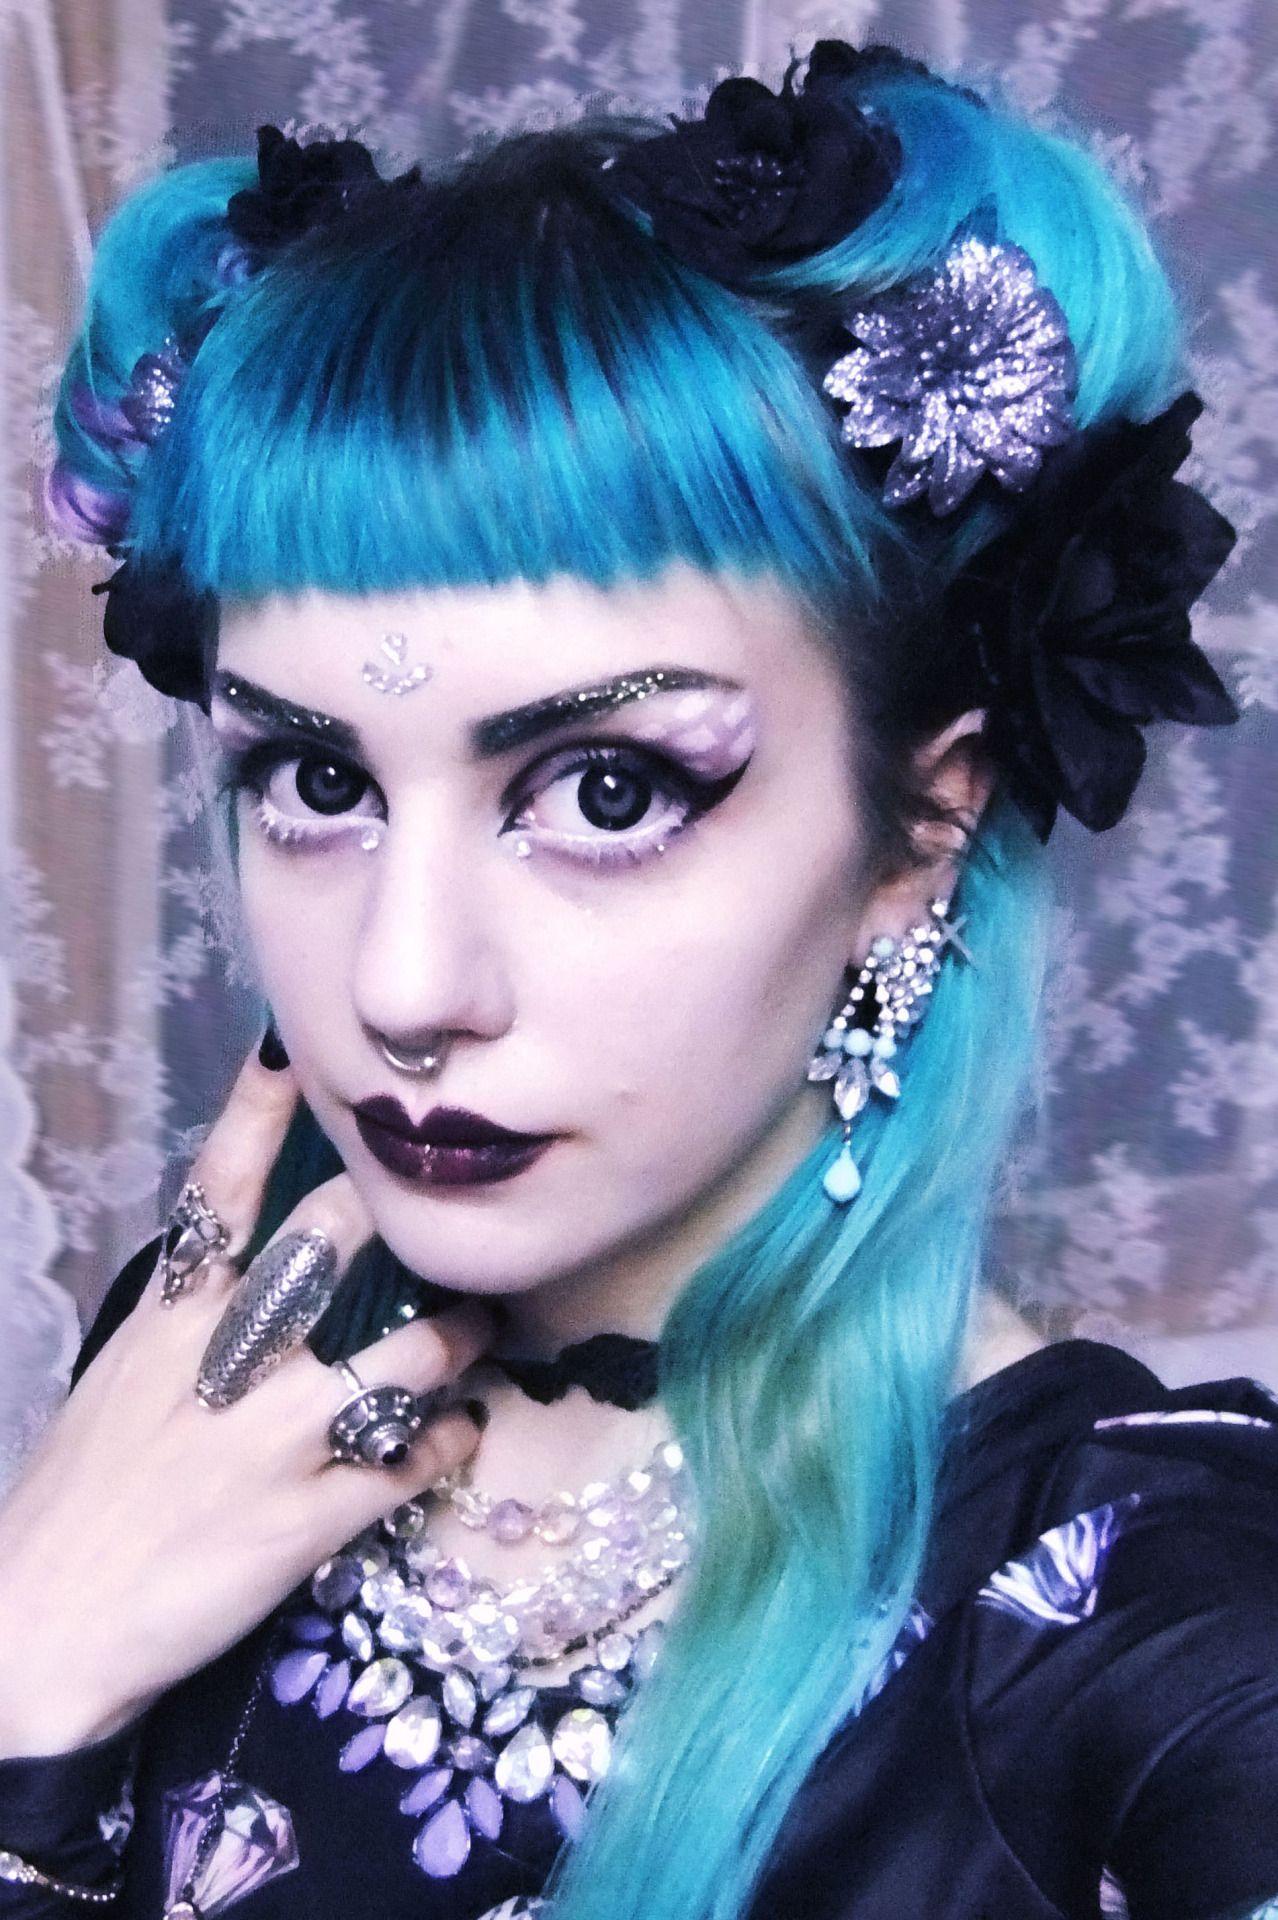 Gotische XLVI SCHONE GOTISCHE DAMEN Pinterest